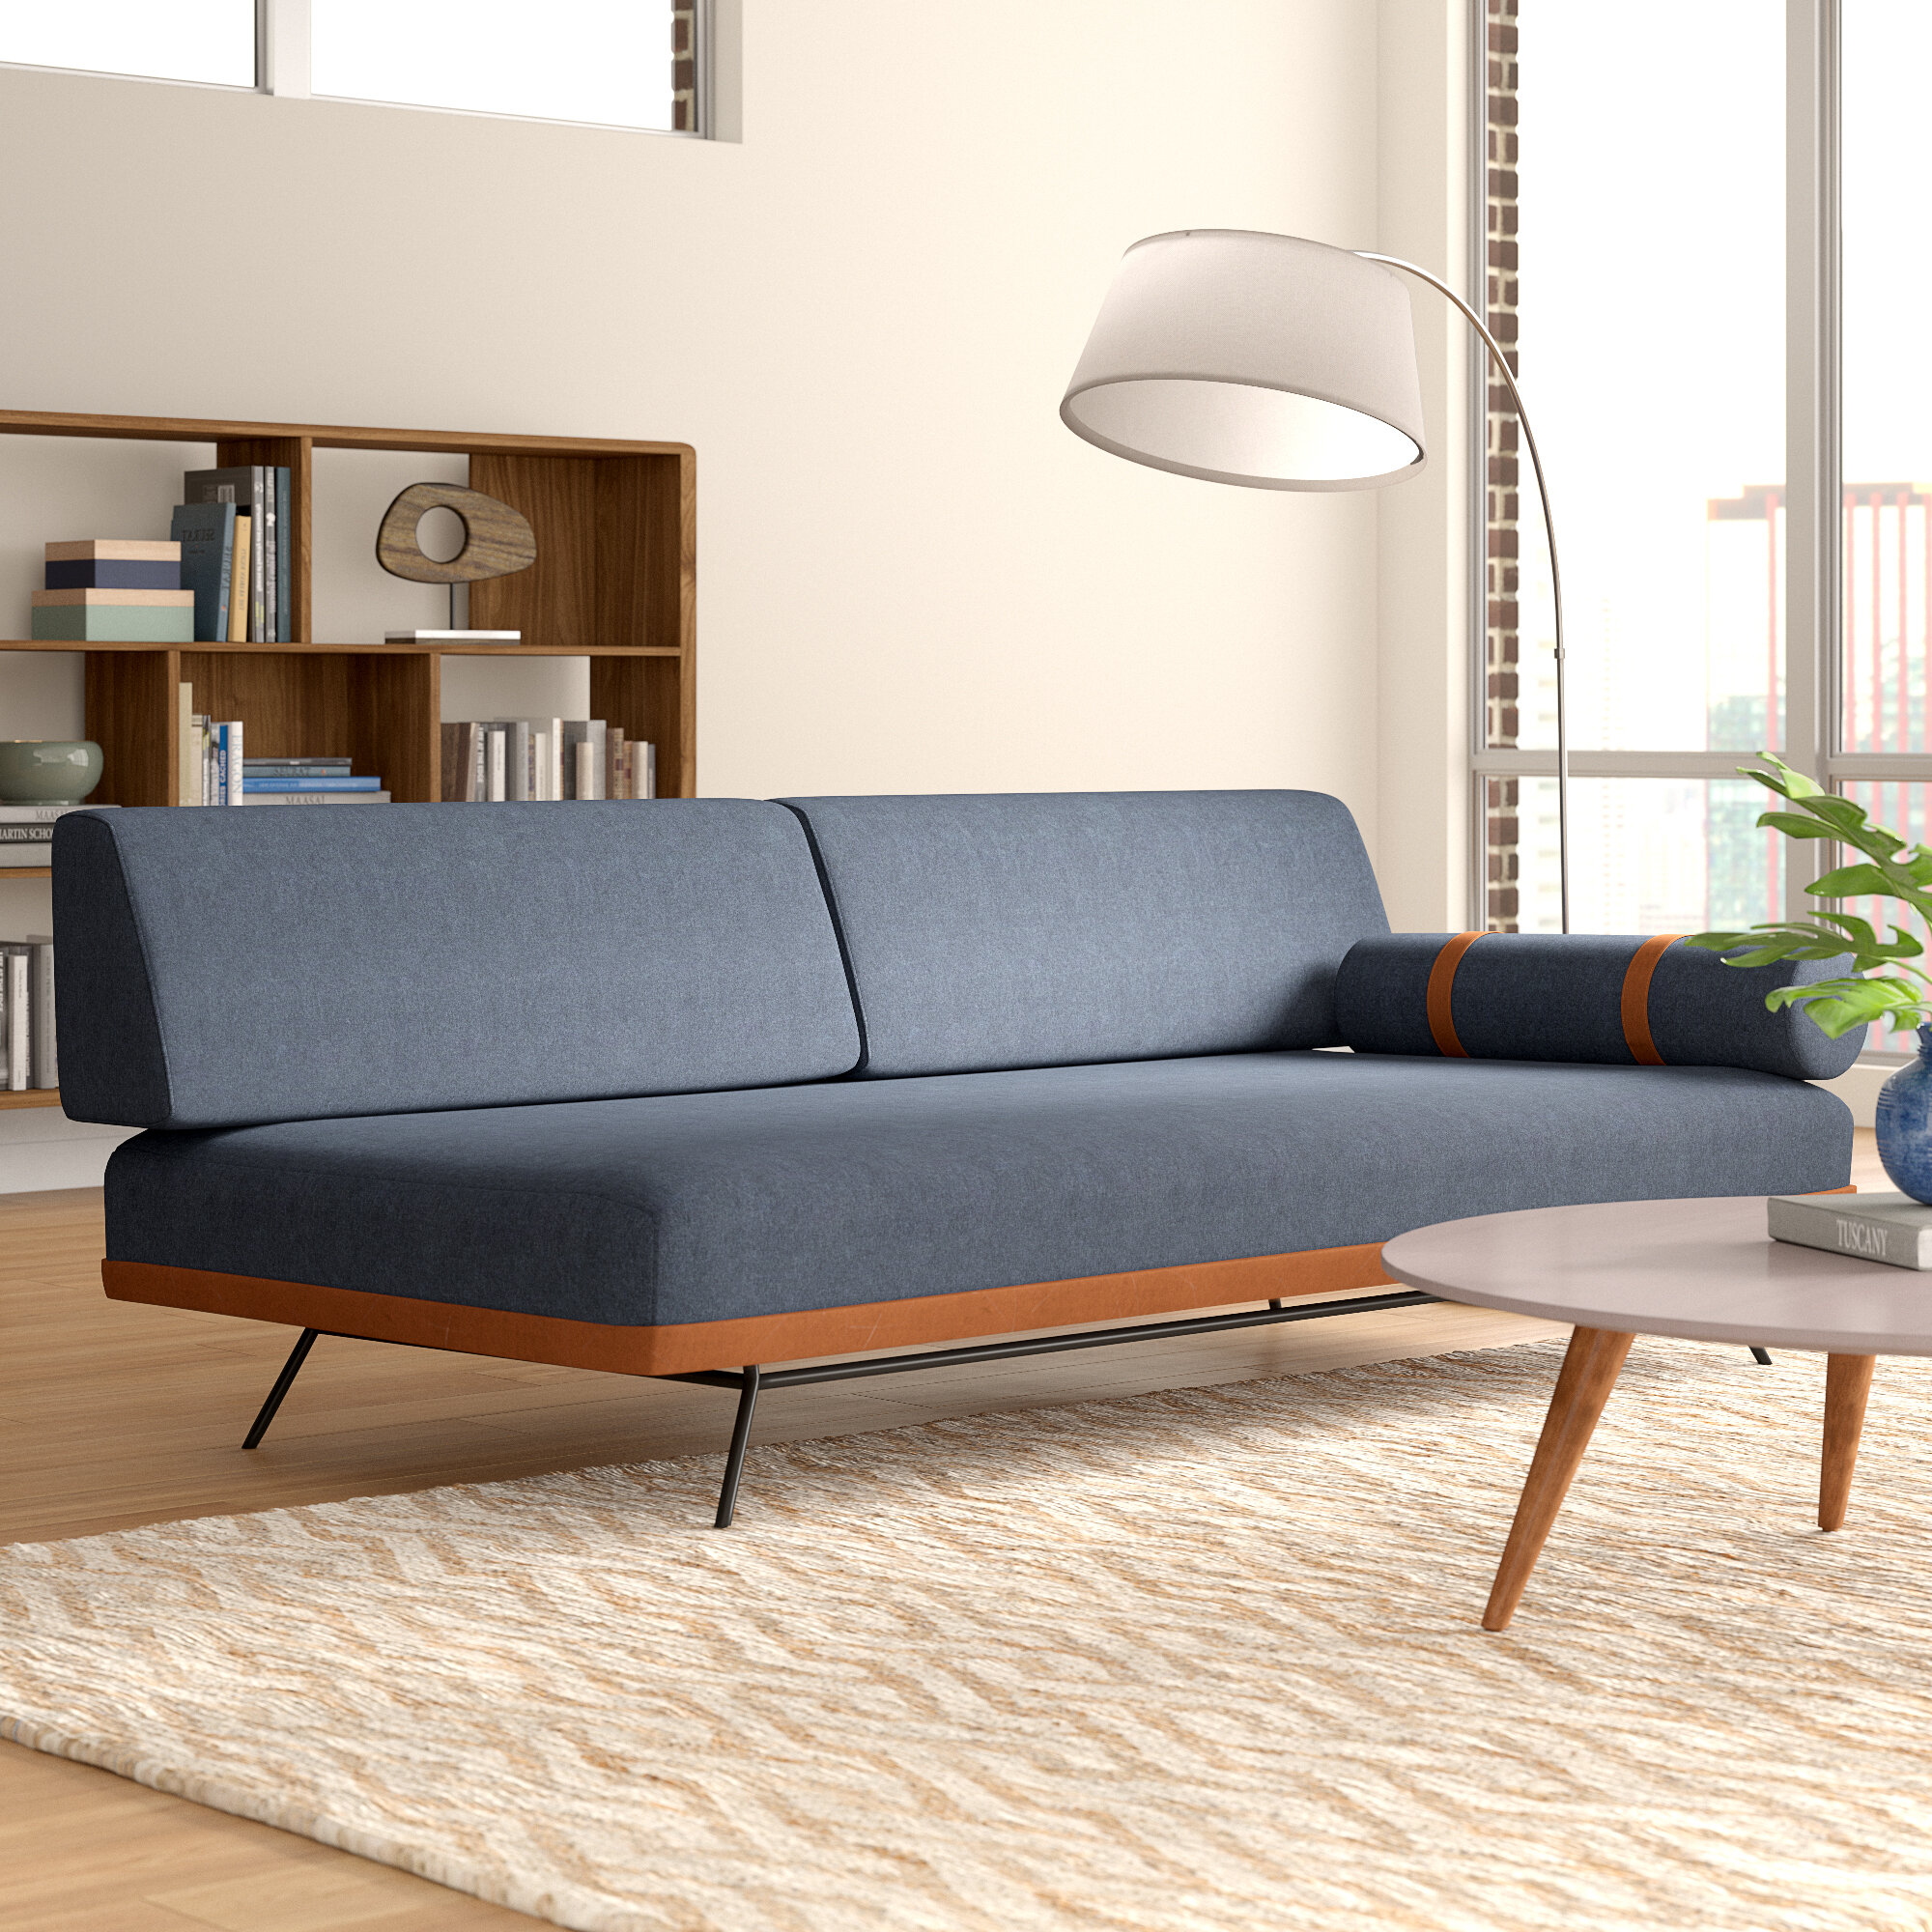 Corrigan studio ilminster chaise lounge reviews wayfair